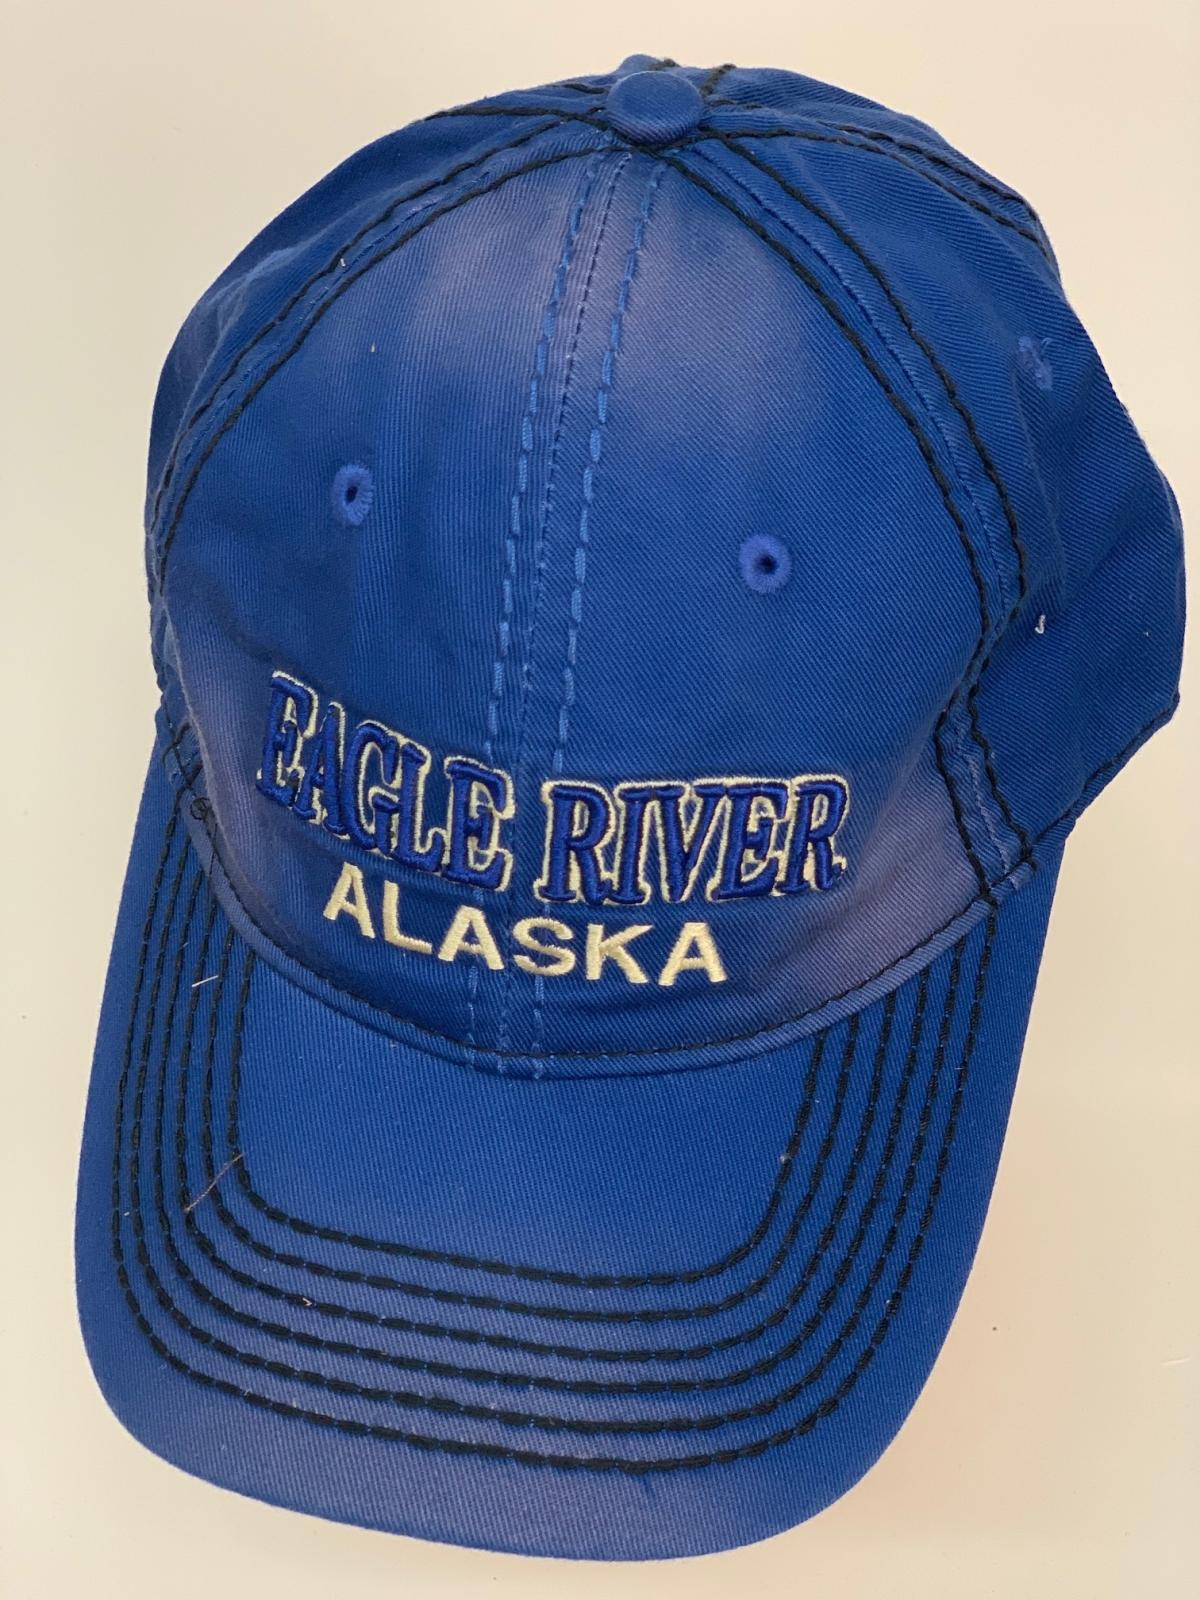 Бейсболка Alaska глубокого синего цвета